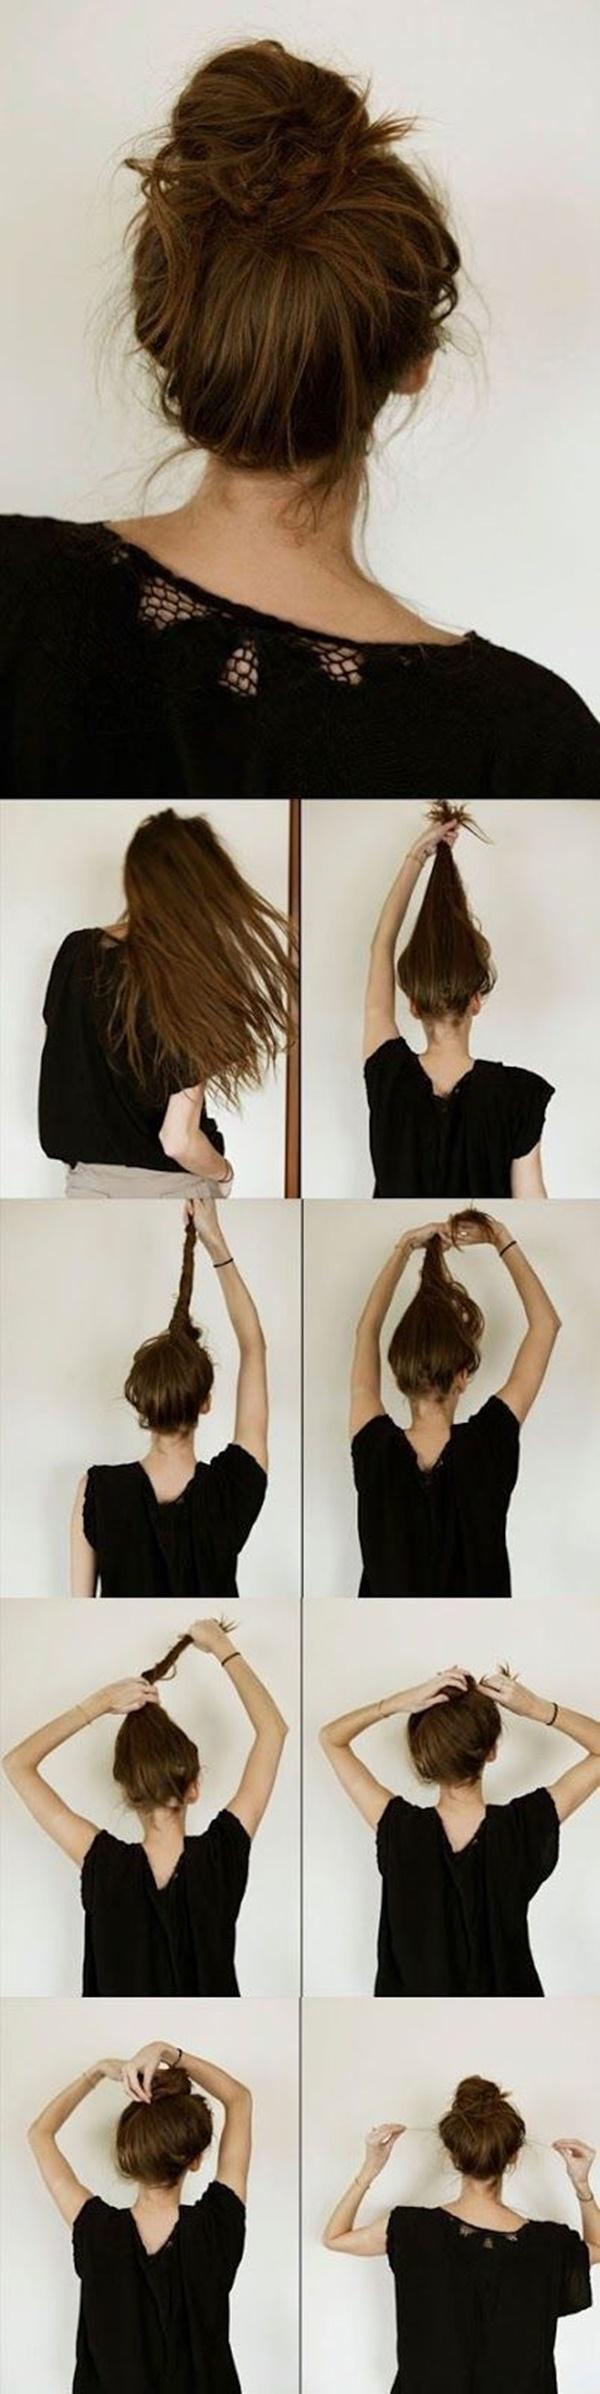 messy-bun-hairstyles-23